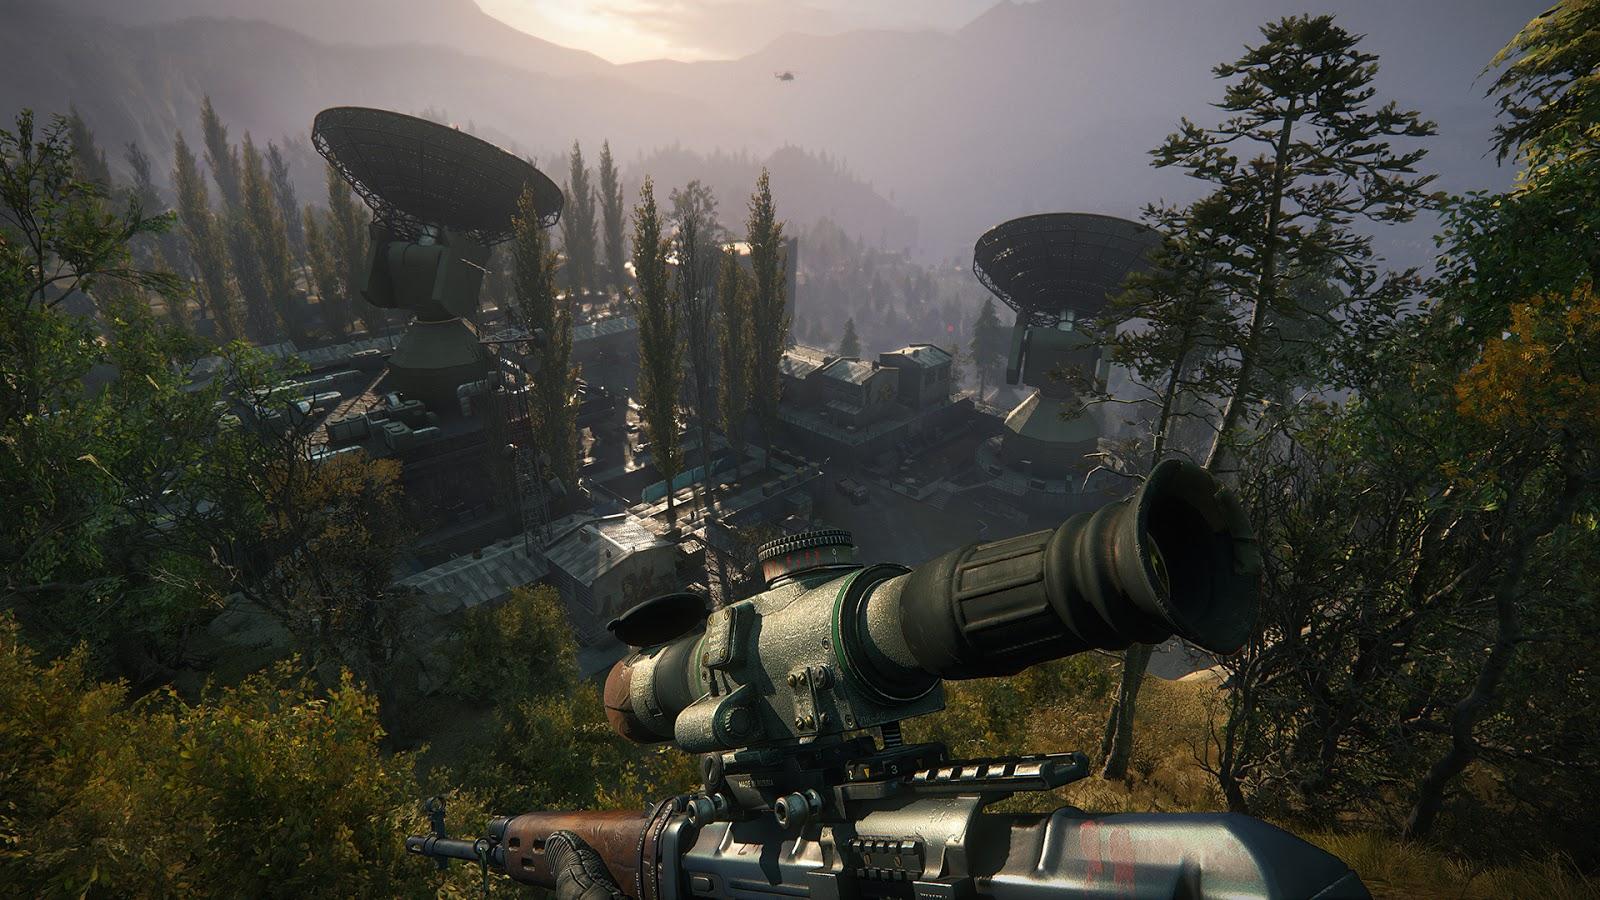 Sniper Ghost Warrior 3 ESPAÑOL PC (CPY) + Update v1.08 (PLAZA) + REPACK 10 DVD5 (JPW) 9